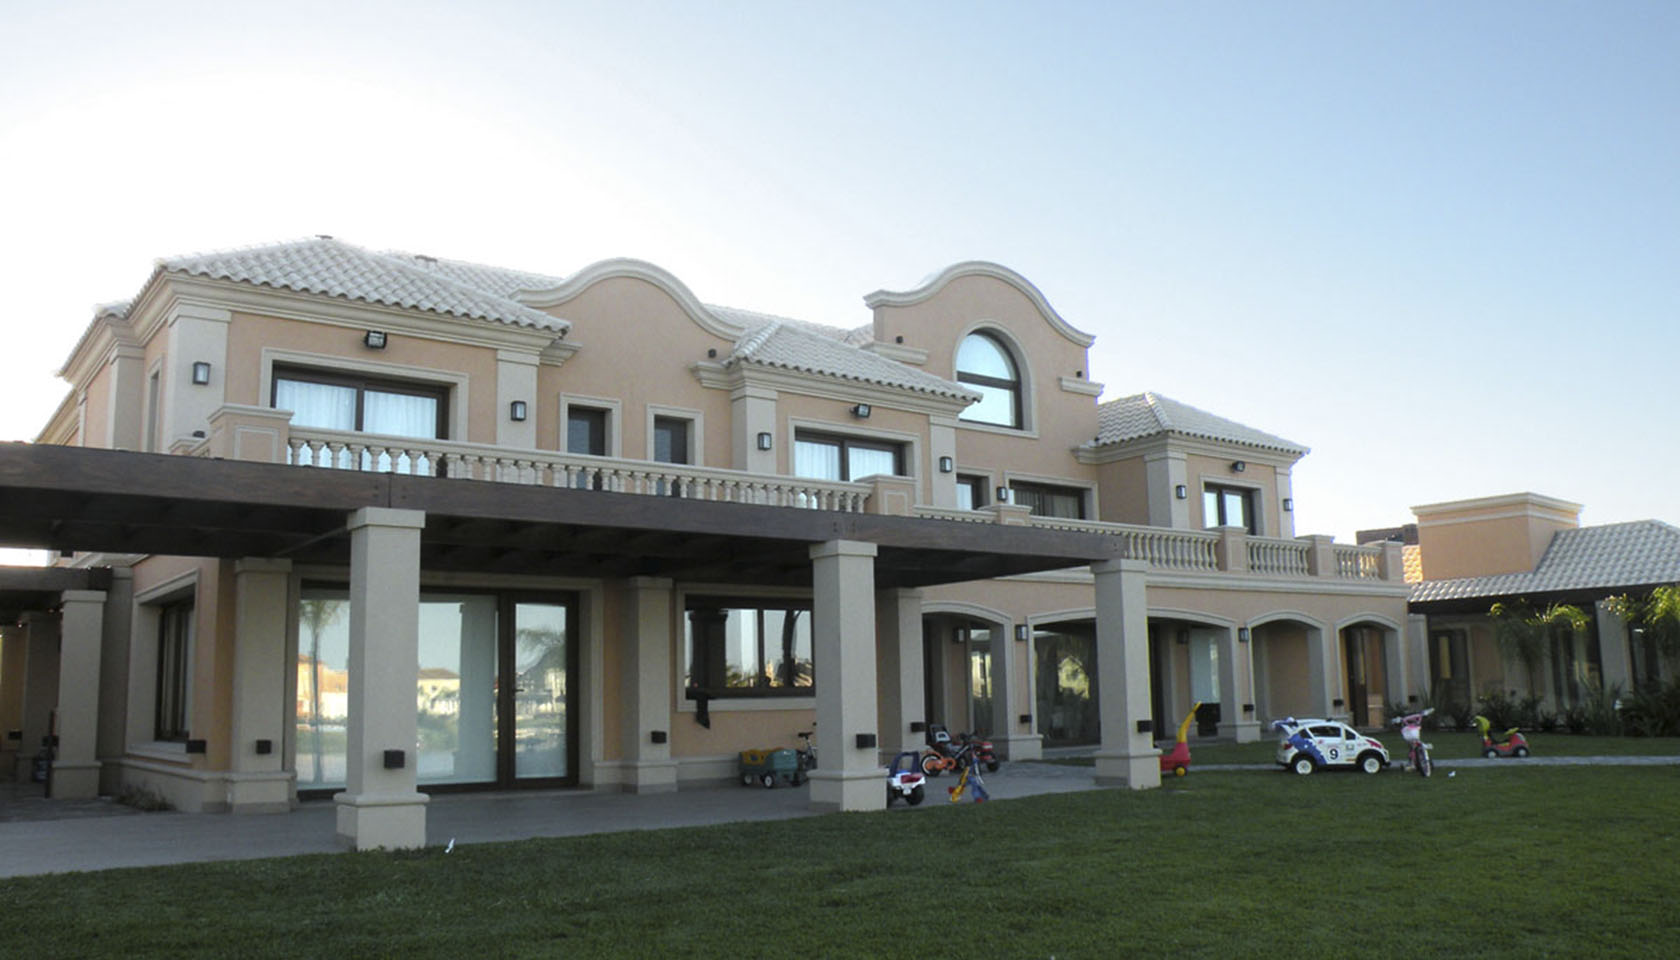 grandes galerías, casas neoclásicas, casas con ornamento